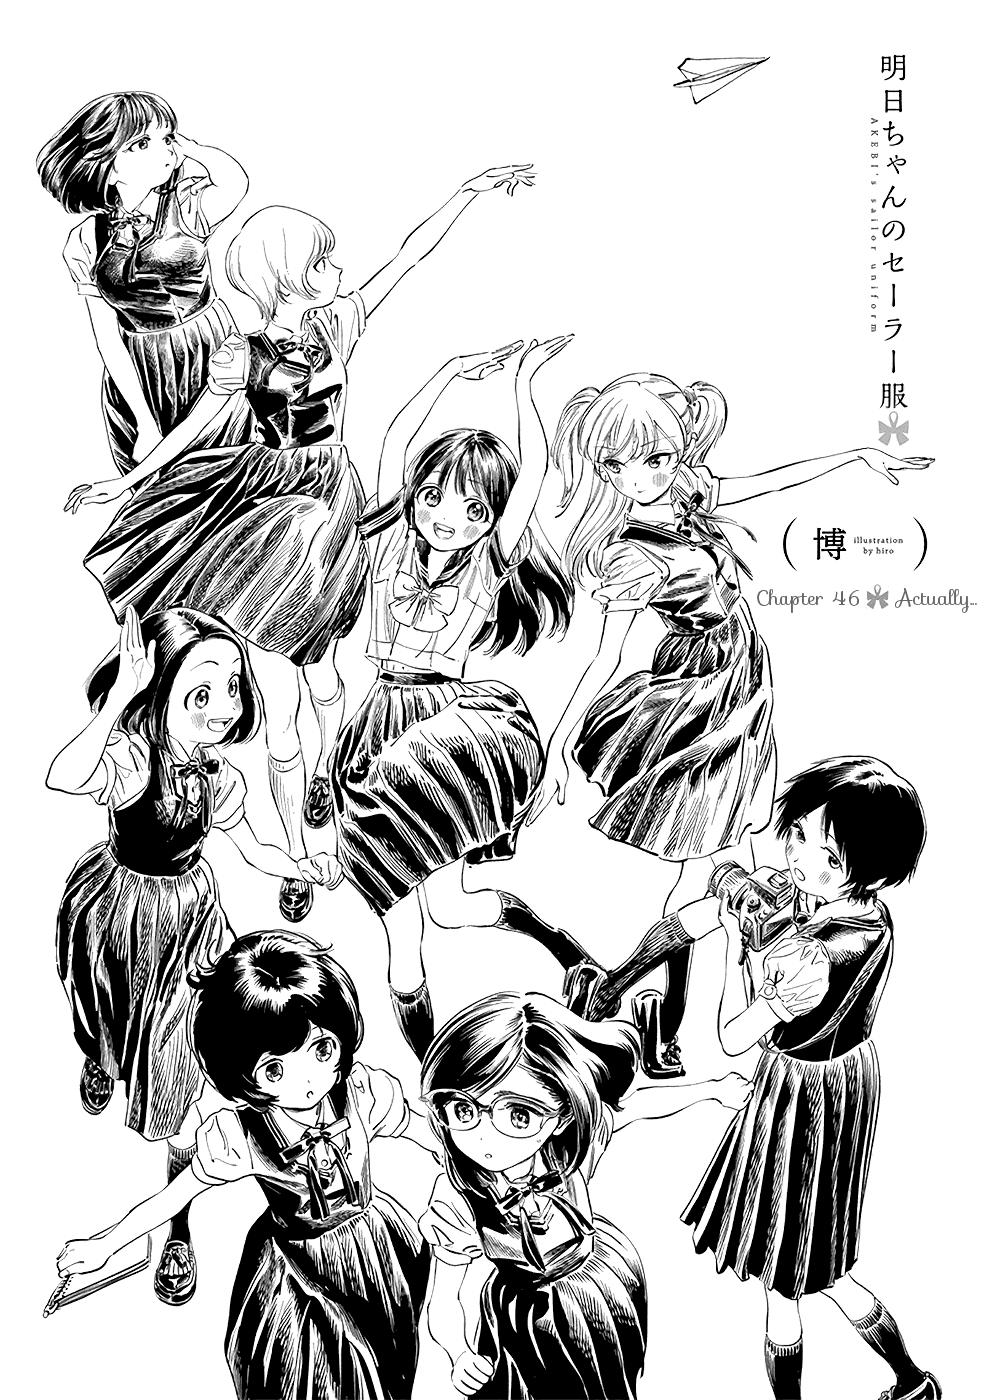 https://manga.mangadogs.com/comics/pic4/36/18532/2550514/64a4250dded75fcc7ac237f910e8a54e.jpg Page 1